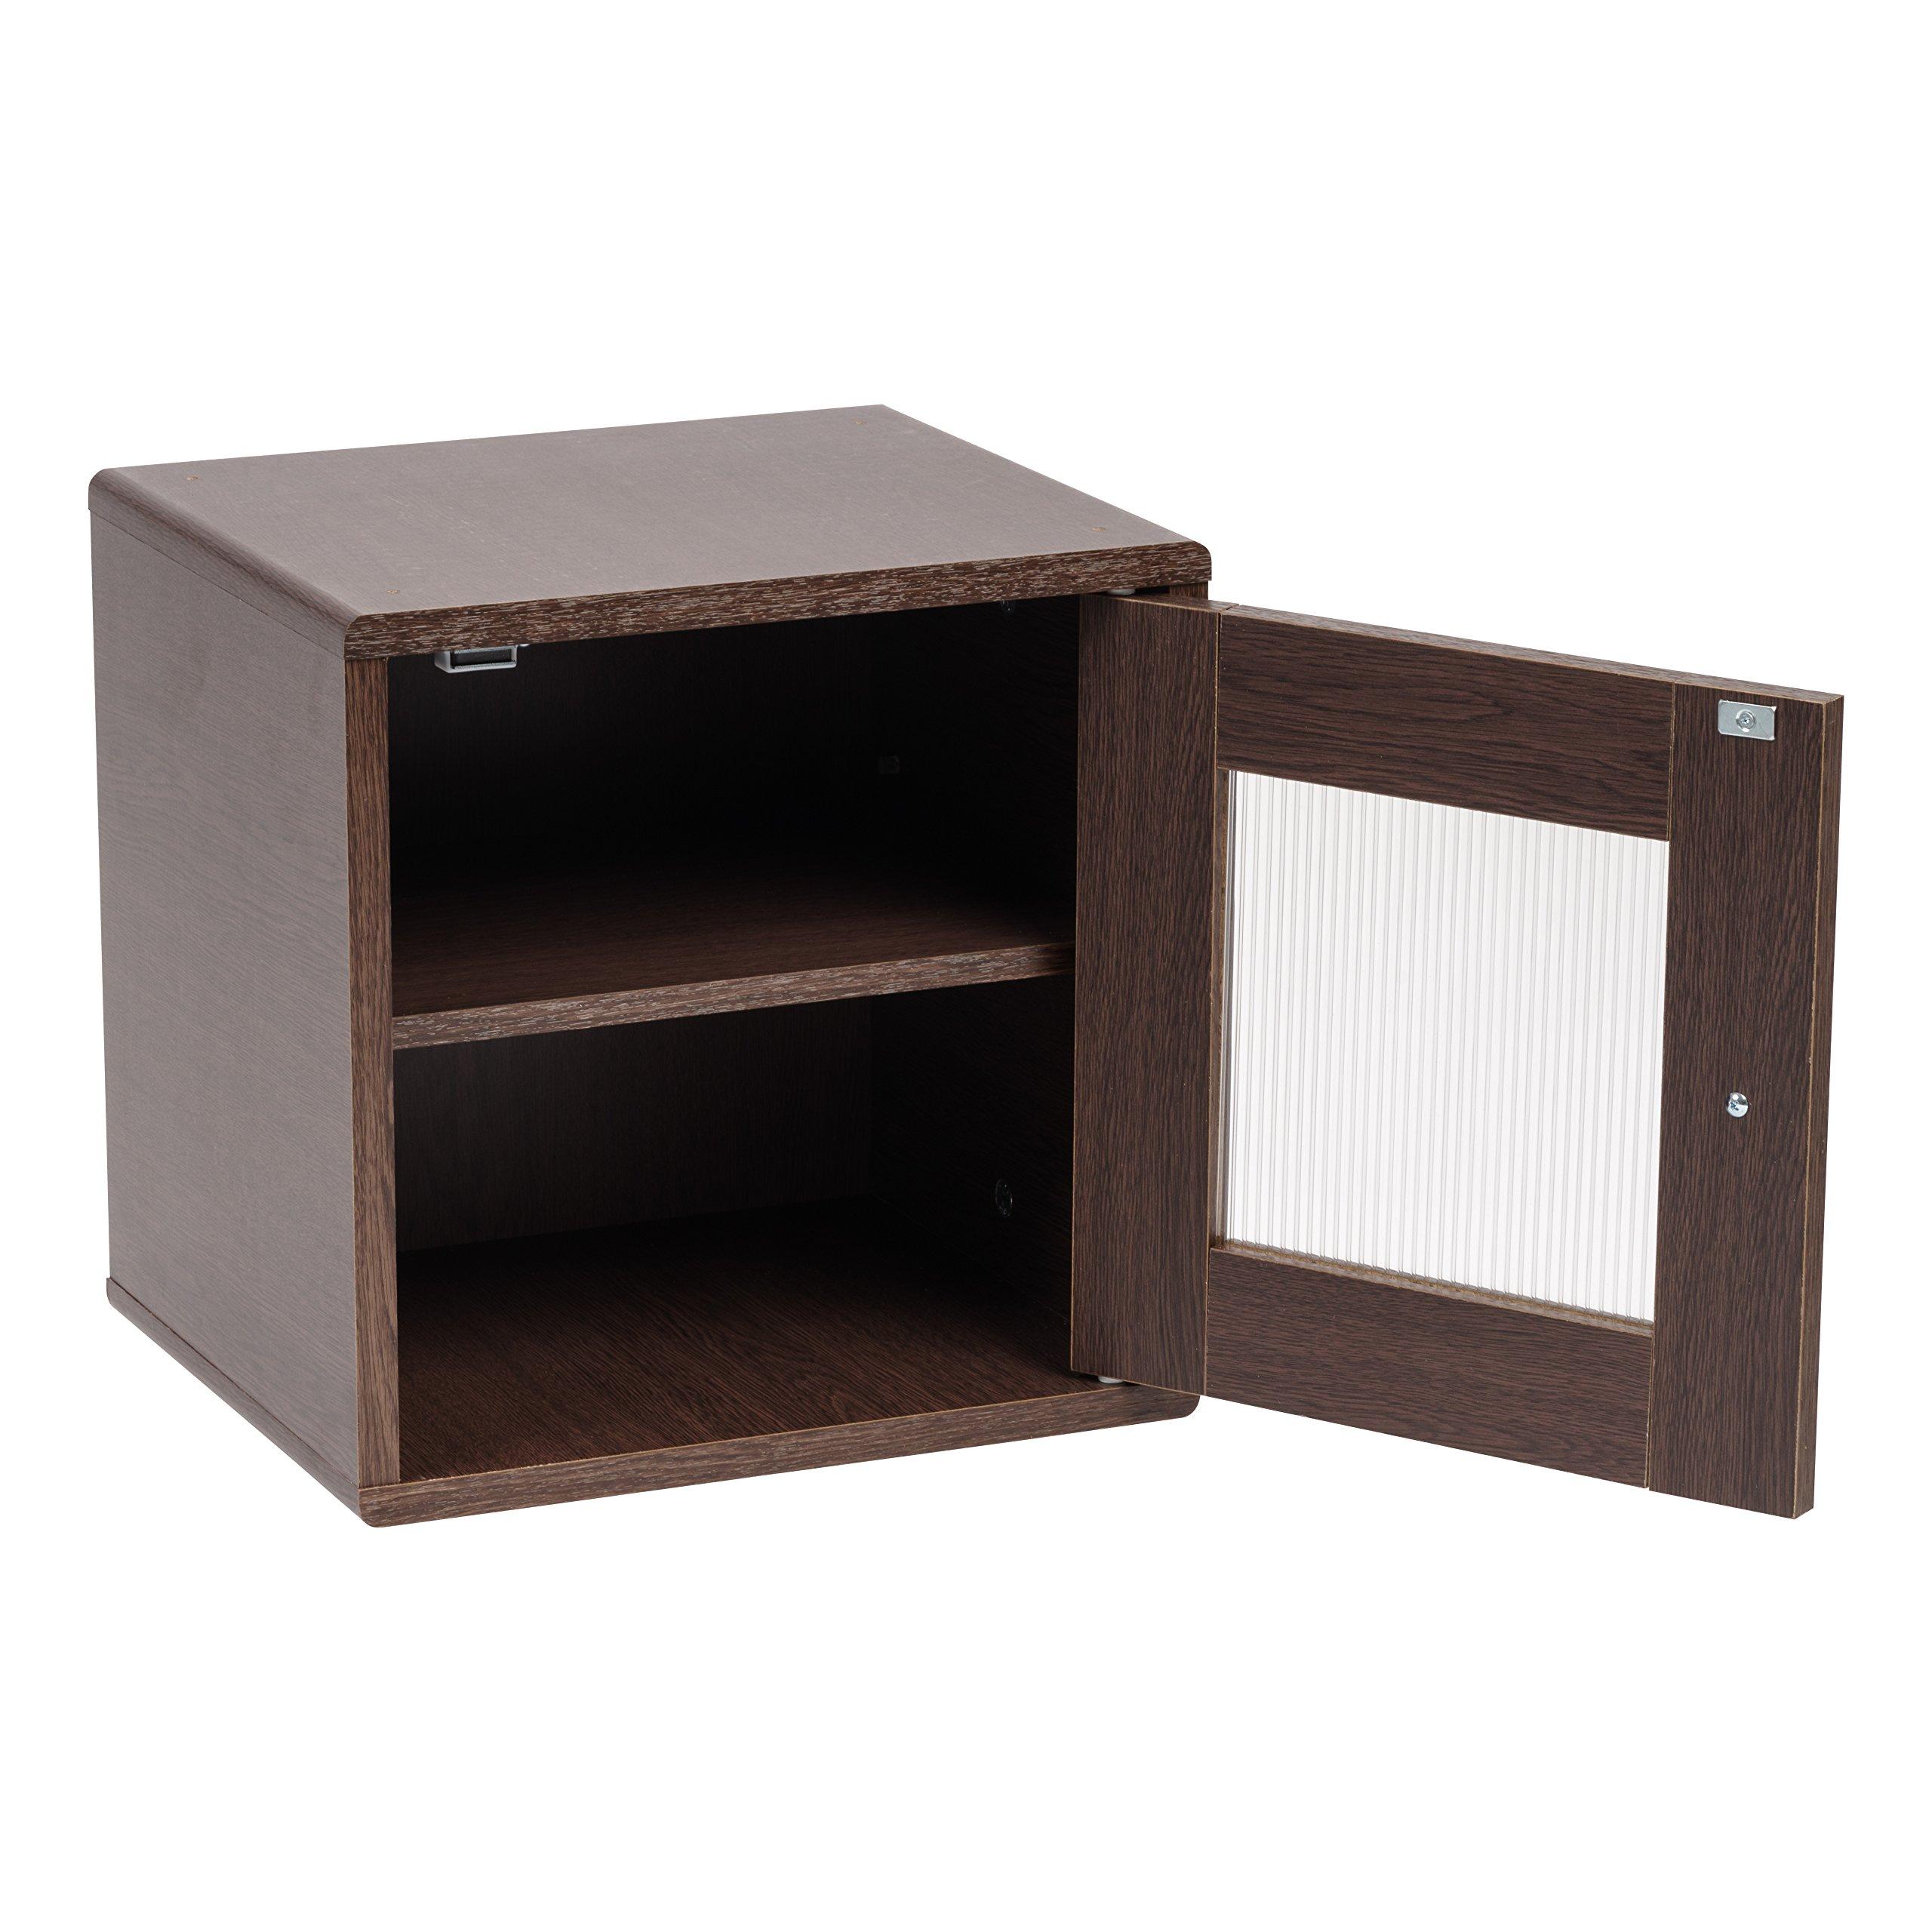 IRIS USA, QR-34PDT, Wood Storage Cube with Window Door, Brown Oak, 1 Pack by IRIS USA, Inc. (Image #3)